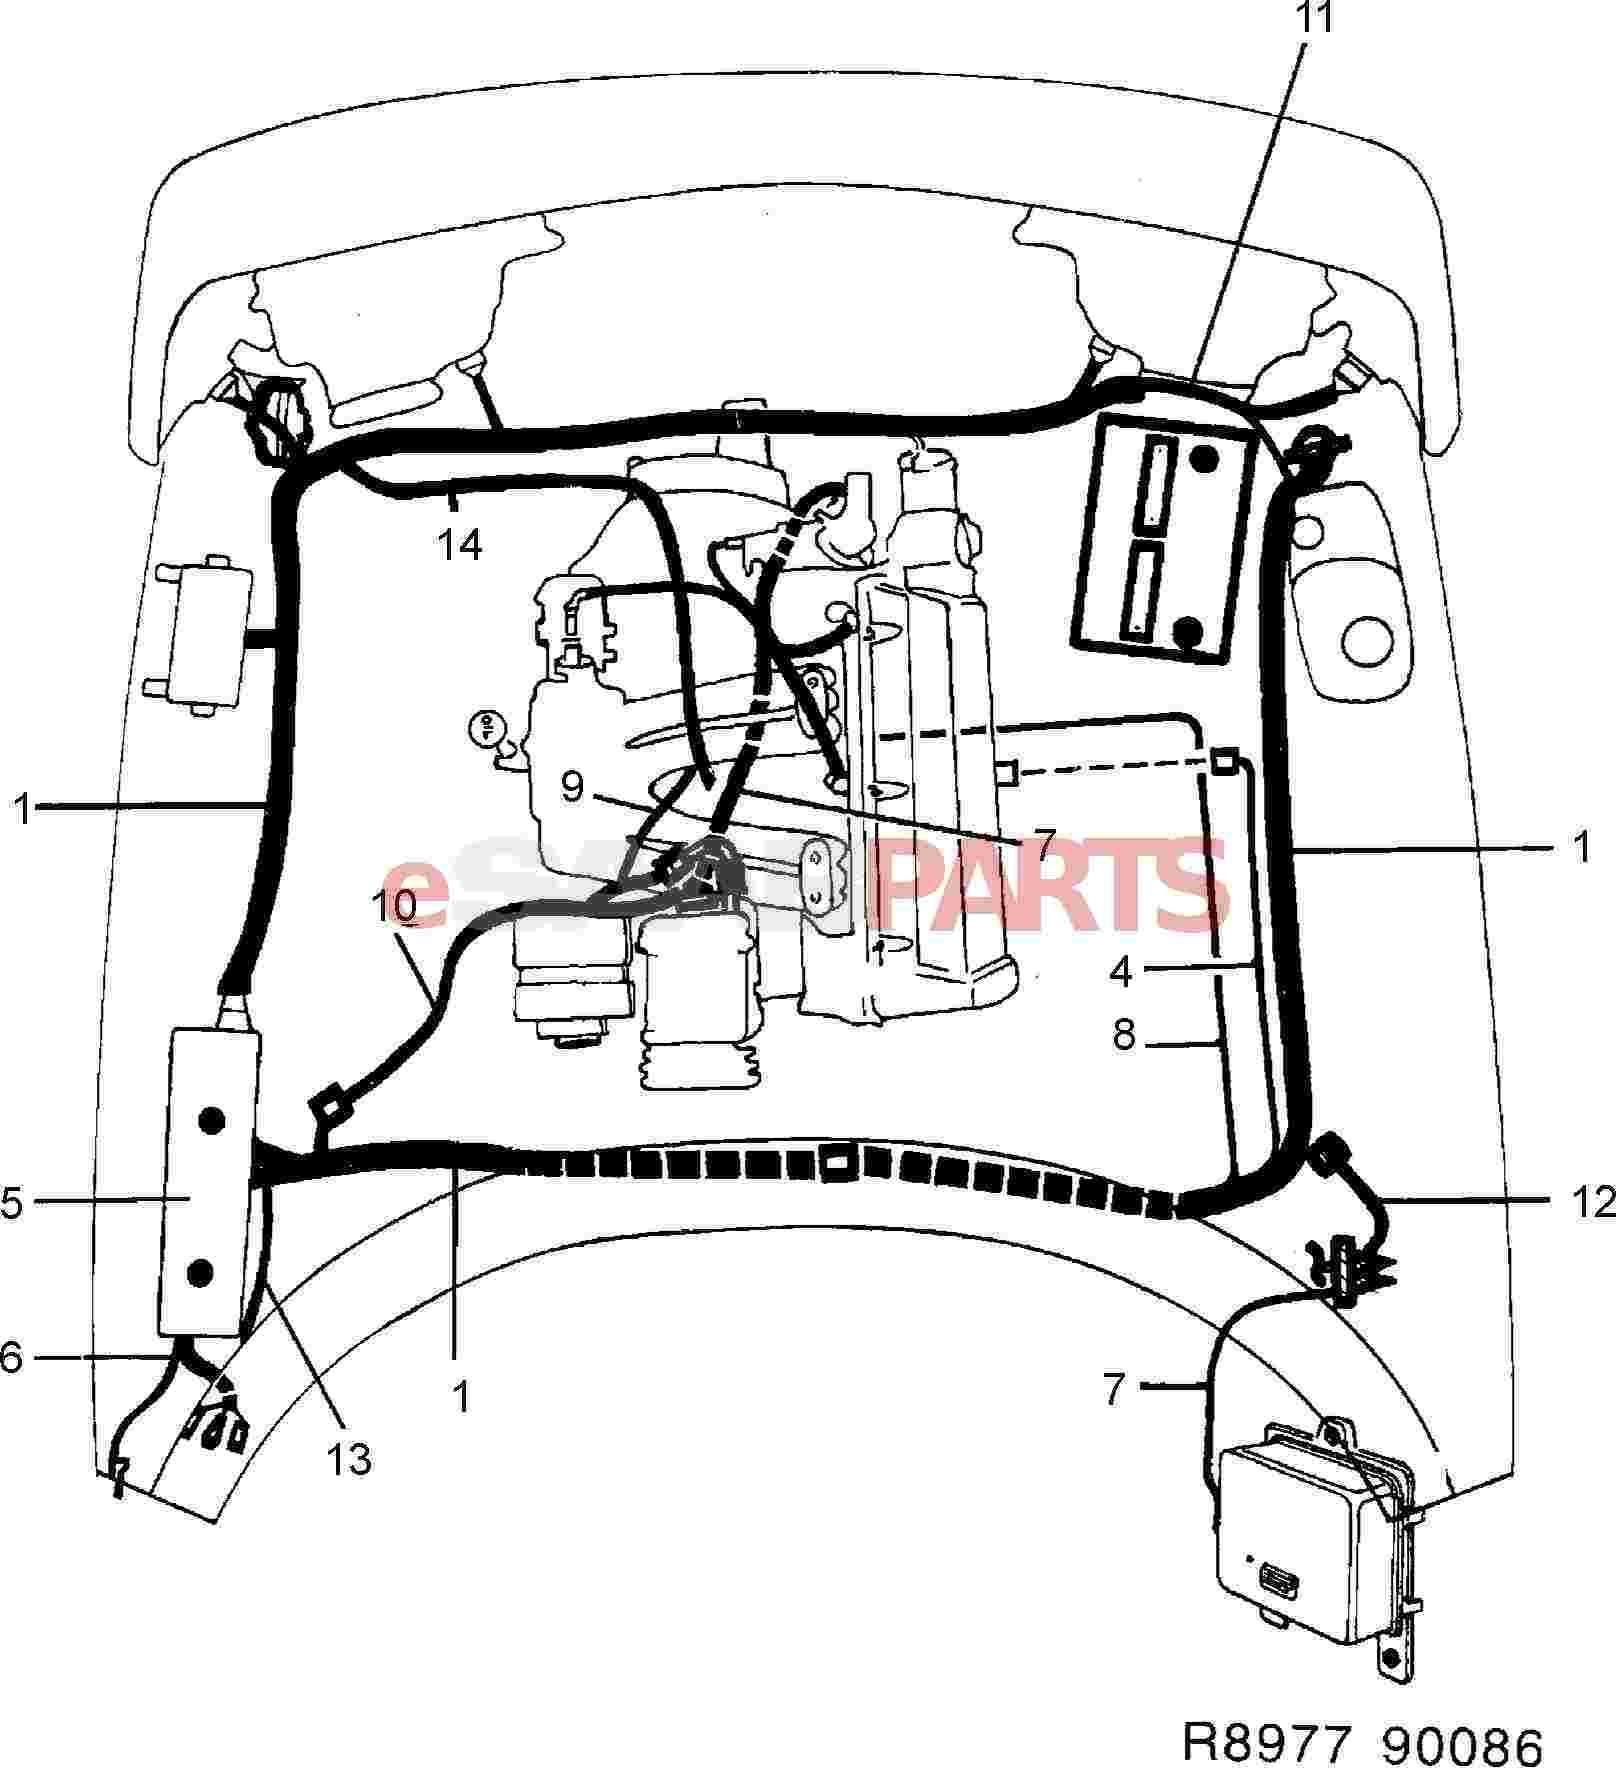 Yamaha Wiring System in addition Honda Trx450er Wiring Schematics additionally 24 Volt Trolling Motor Wiring Diagram furthermore Ktm Parts Diagram likewise 2001 Yz250f Engine Diagram. on ktm 450 exc wiring diagram